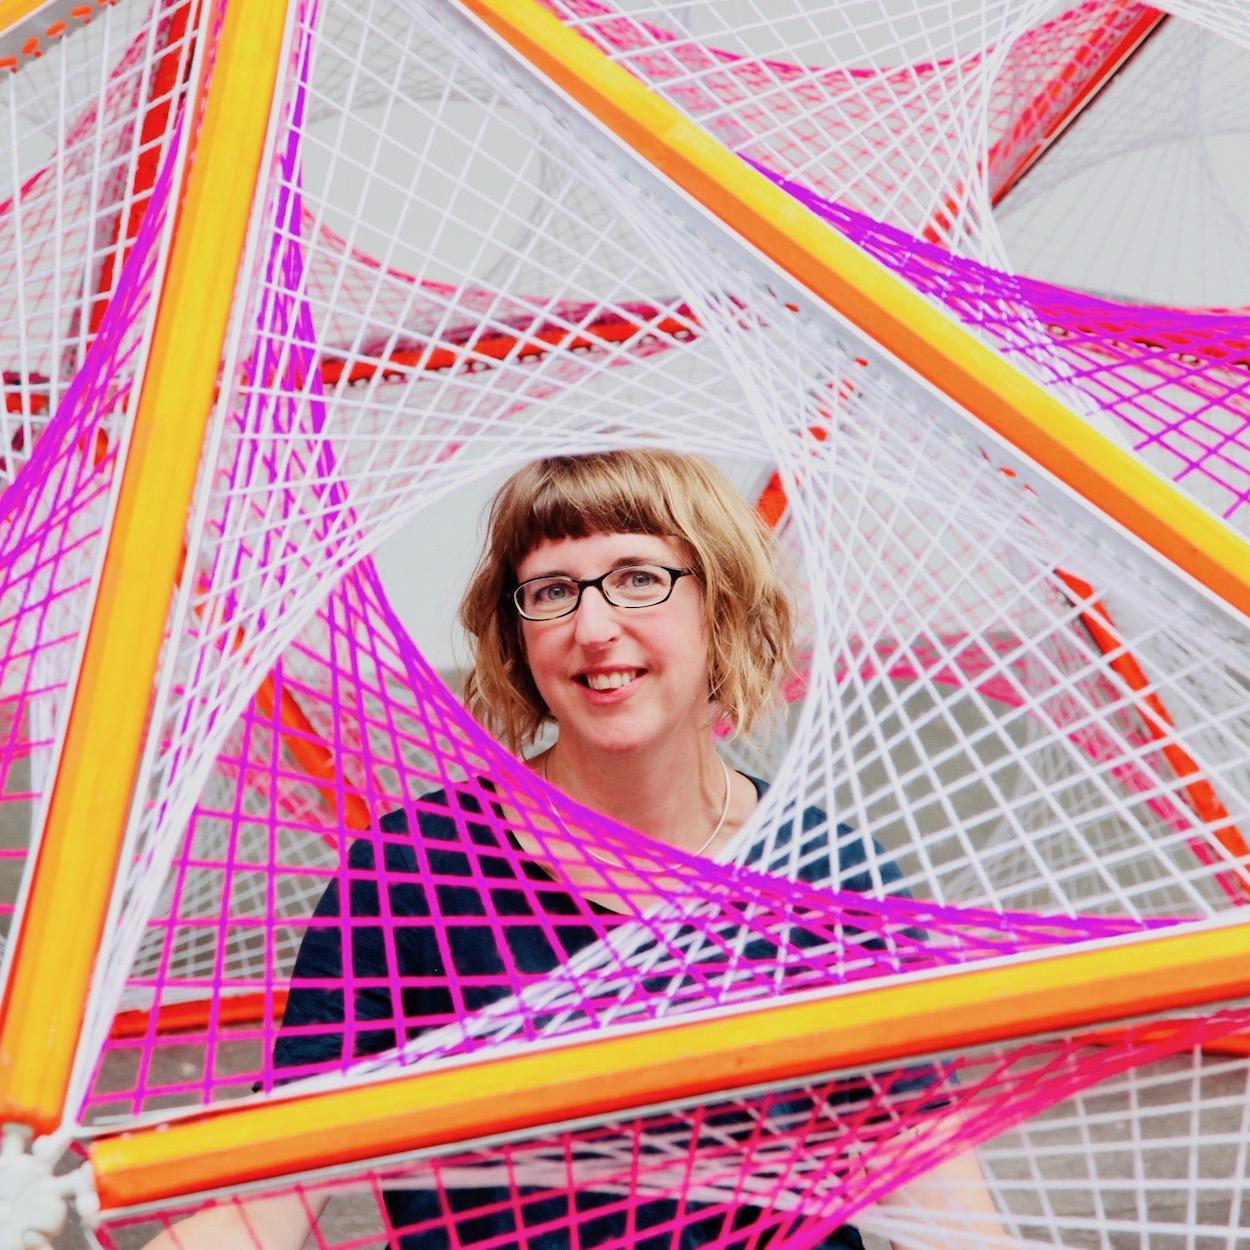 geometric-dome-string-ultra-violet-hannah-ayre.jpg